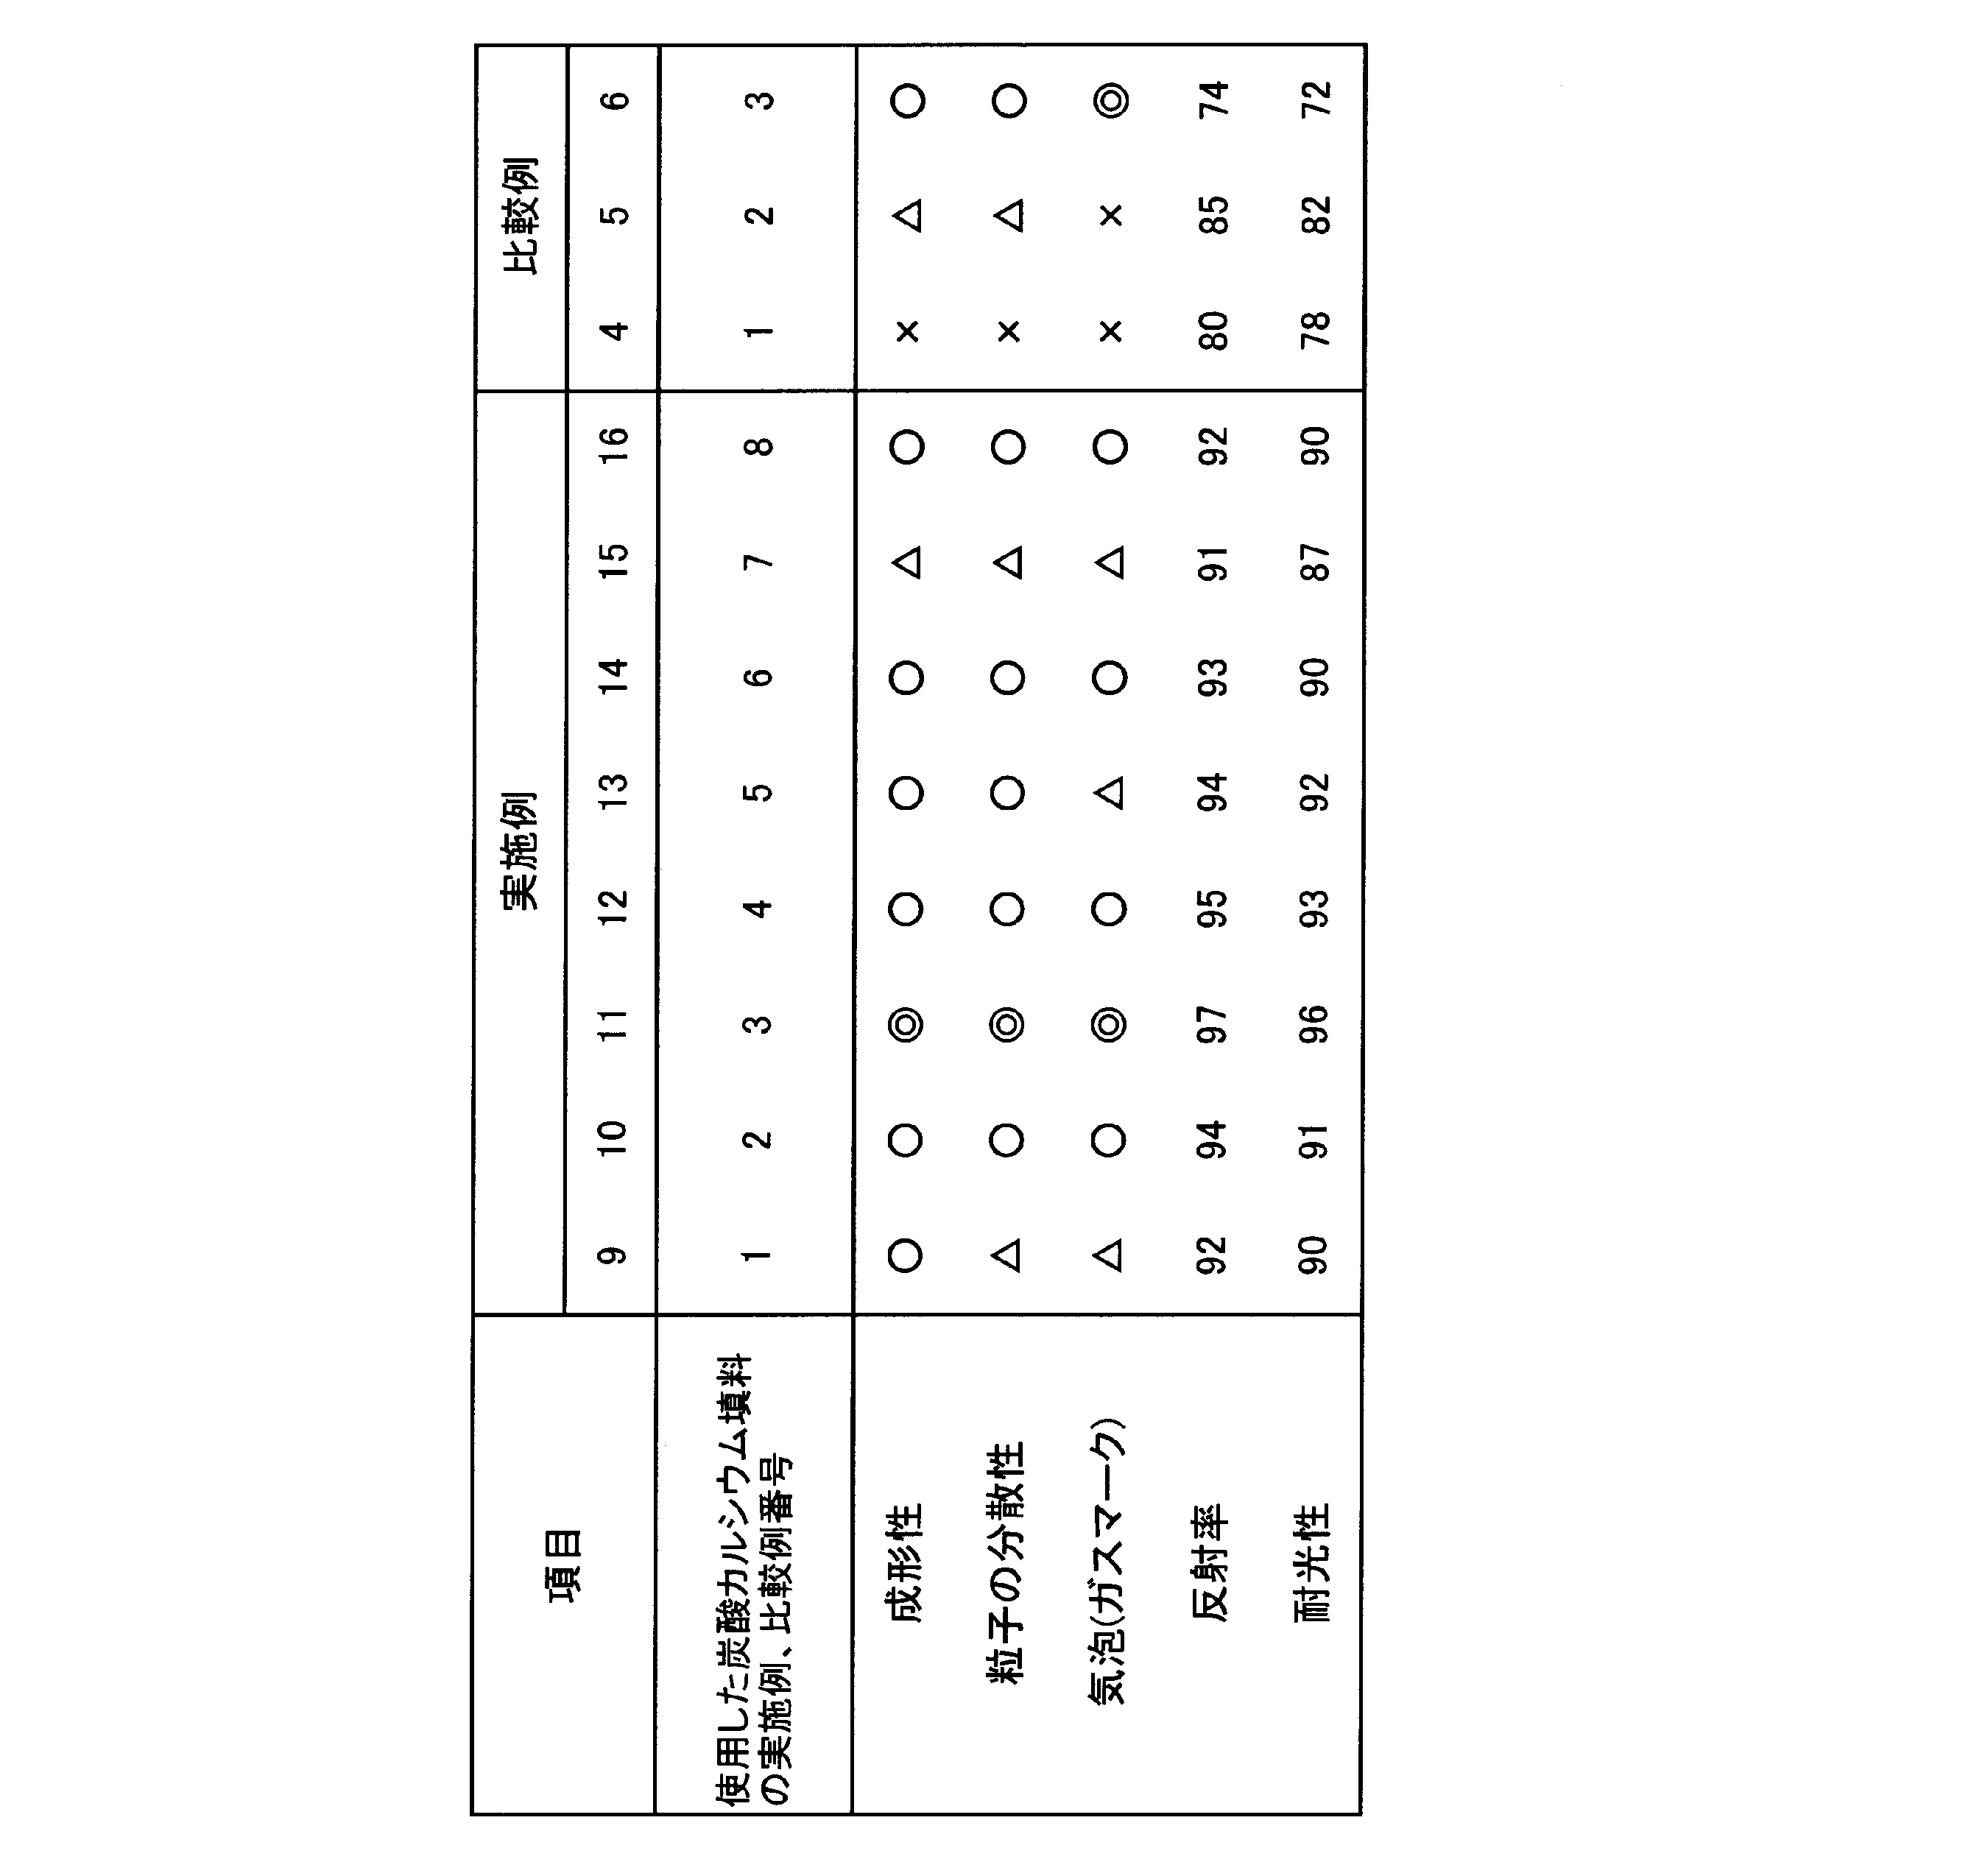 WO2014058057A2 - 樹脂用炭酸カルシウム填料及び該填料を含む樹脂組成物          - Google PatentsFamily